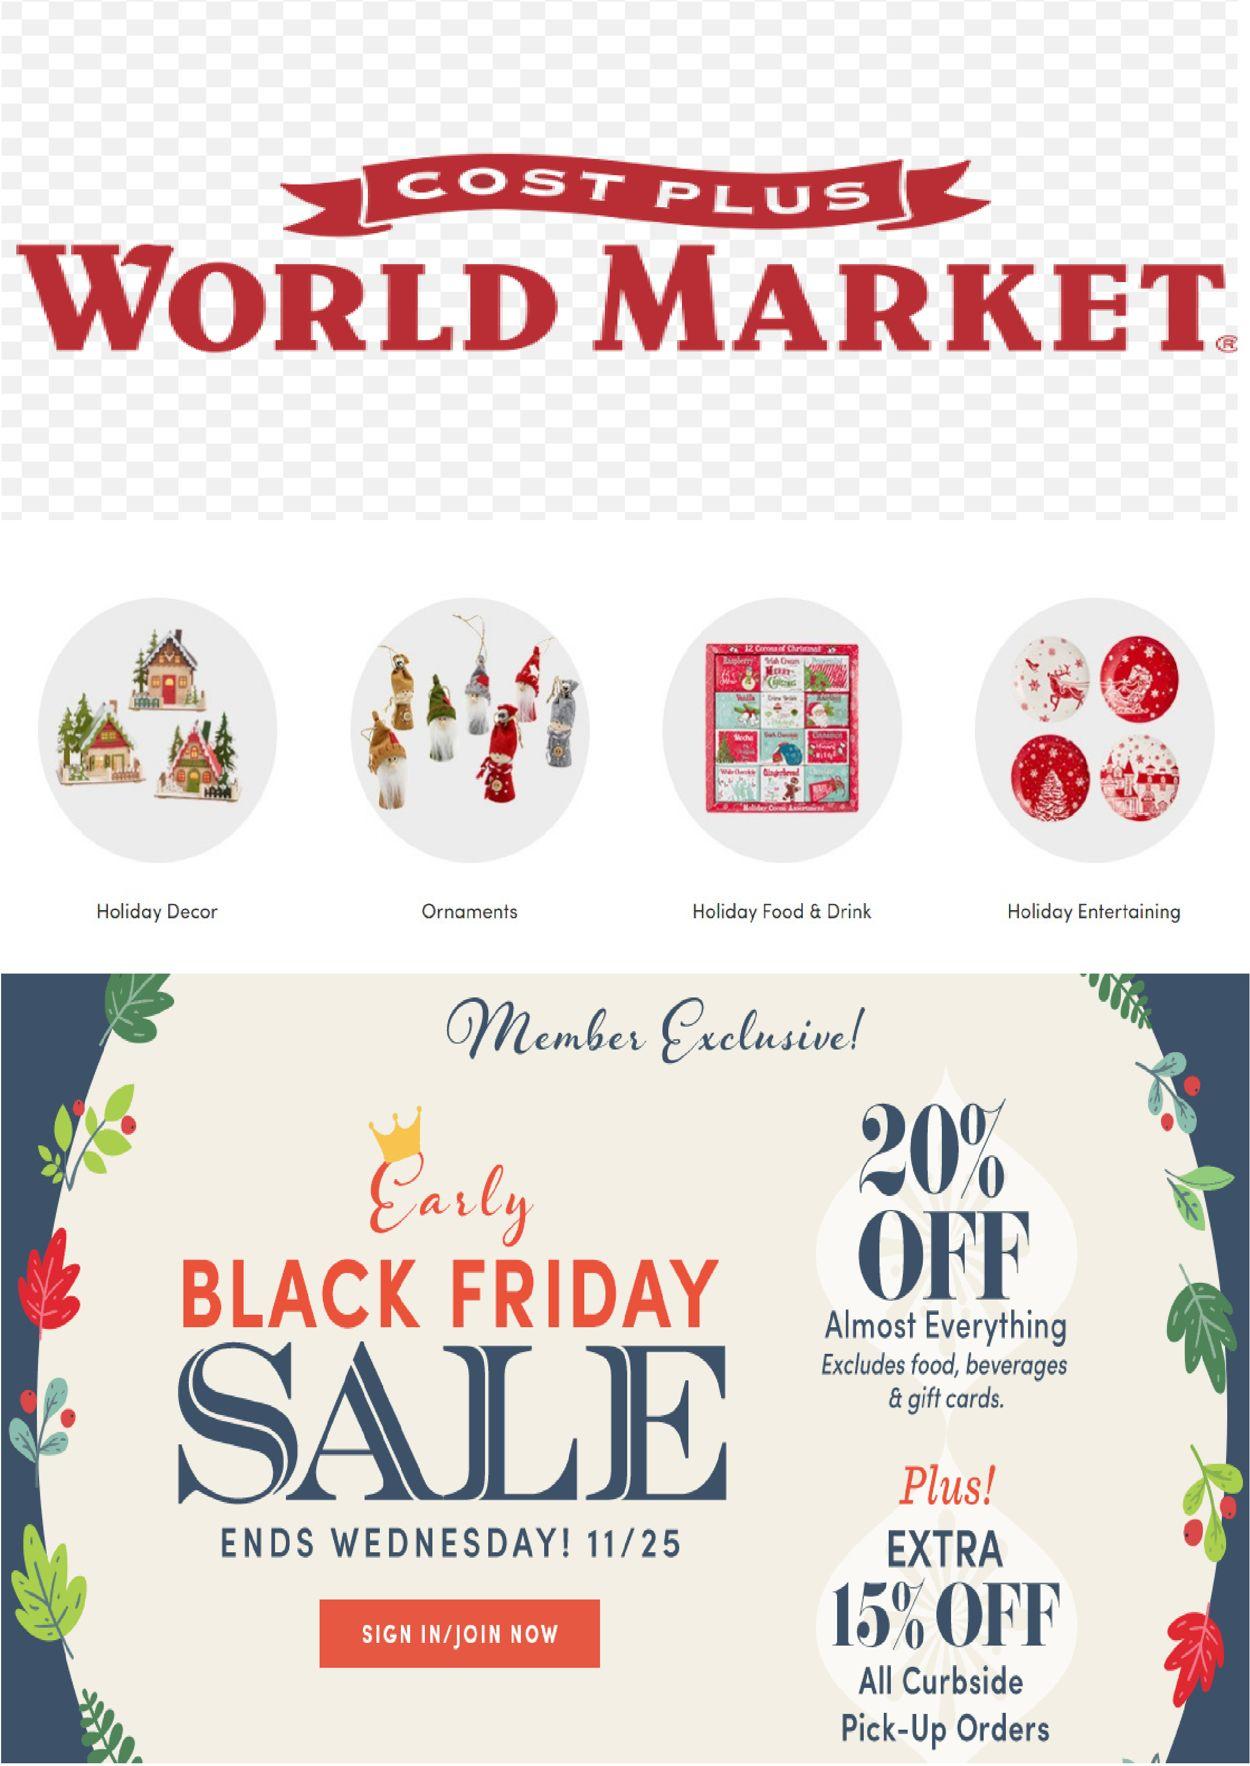 World Market weekly-ad